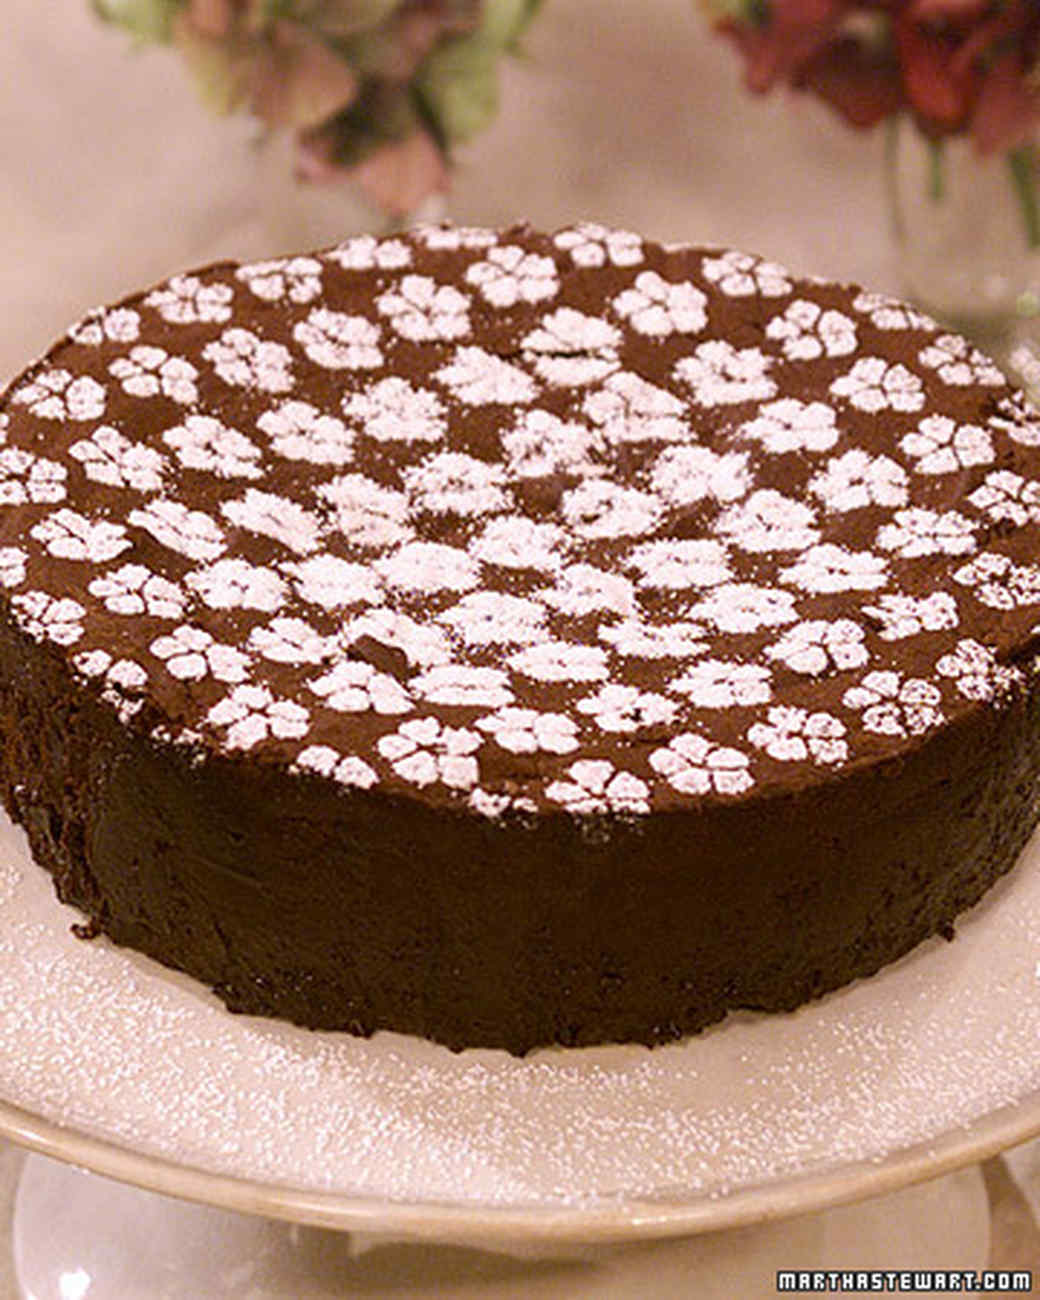 Doris's Velvet Chocolate Cake